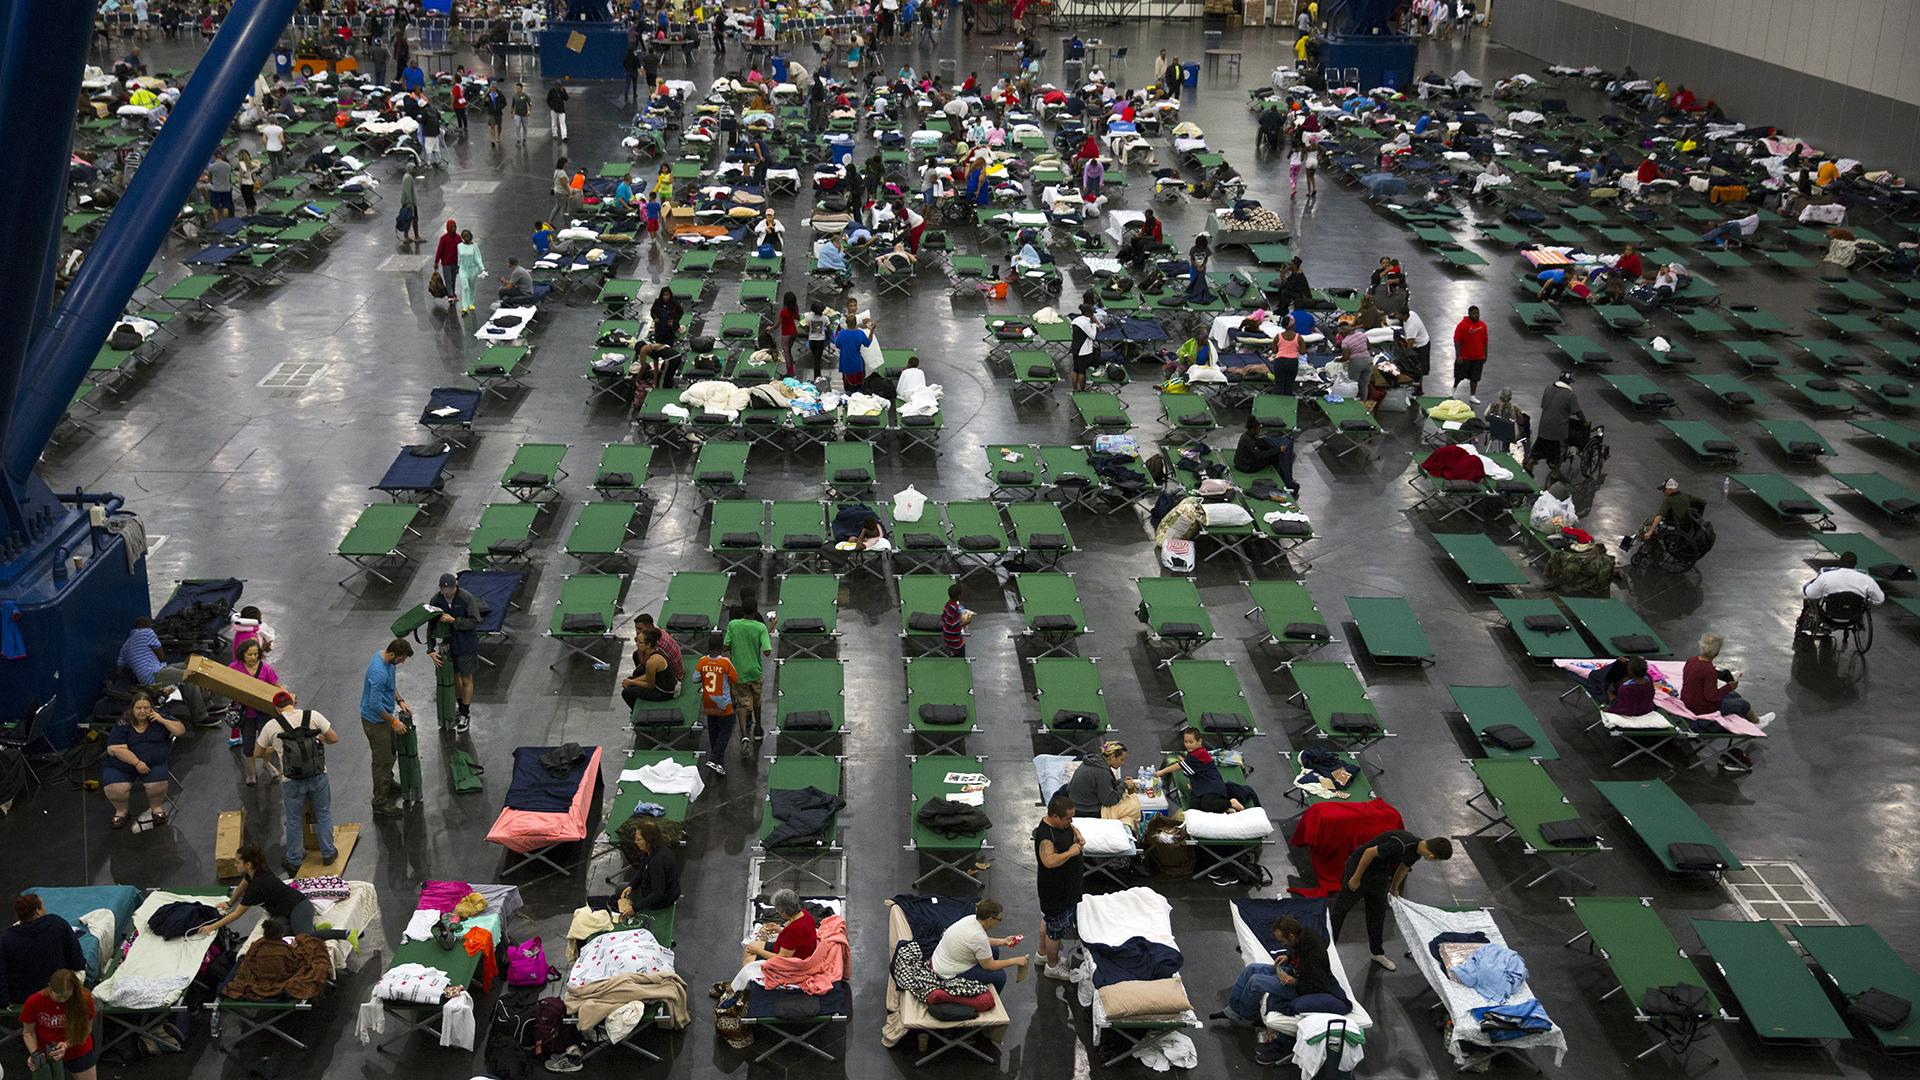 Hurricane Harvey Evacuees at Convention Center-159532.jpg39007733